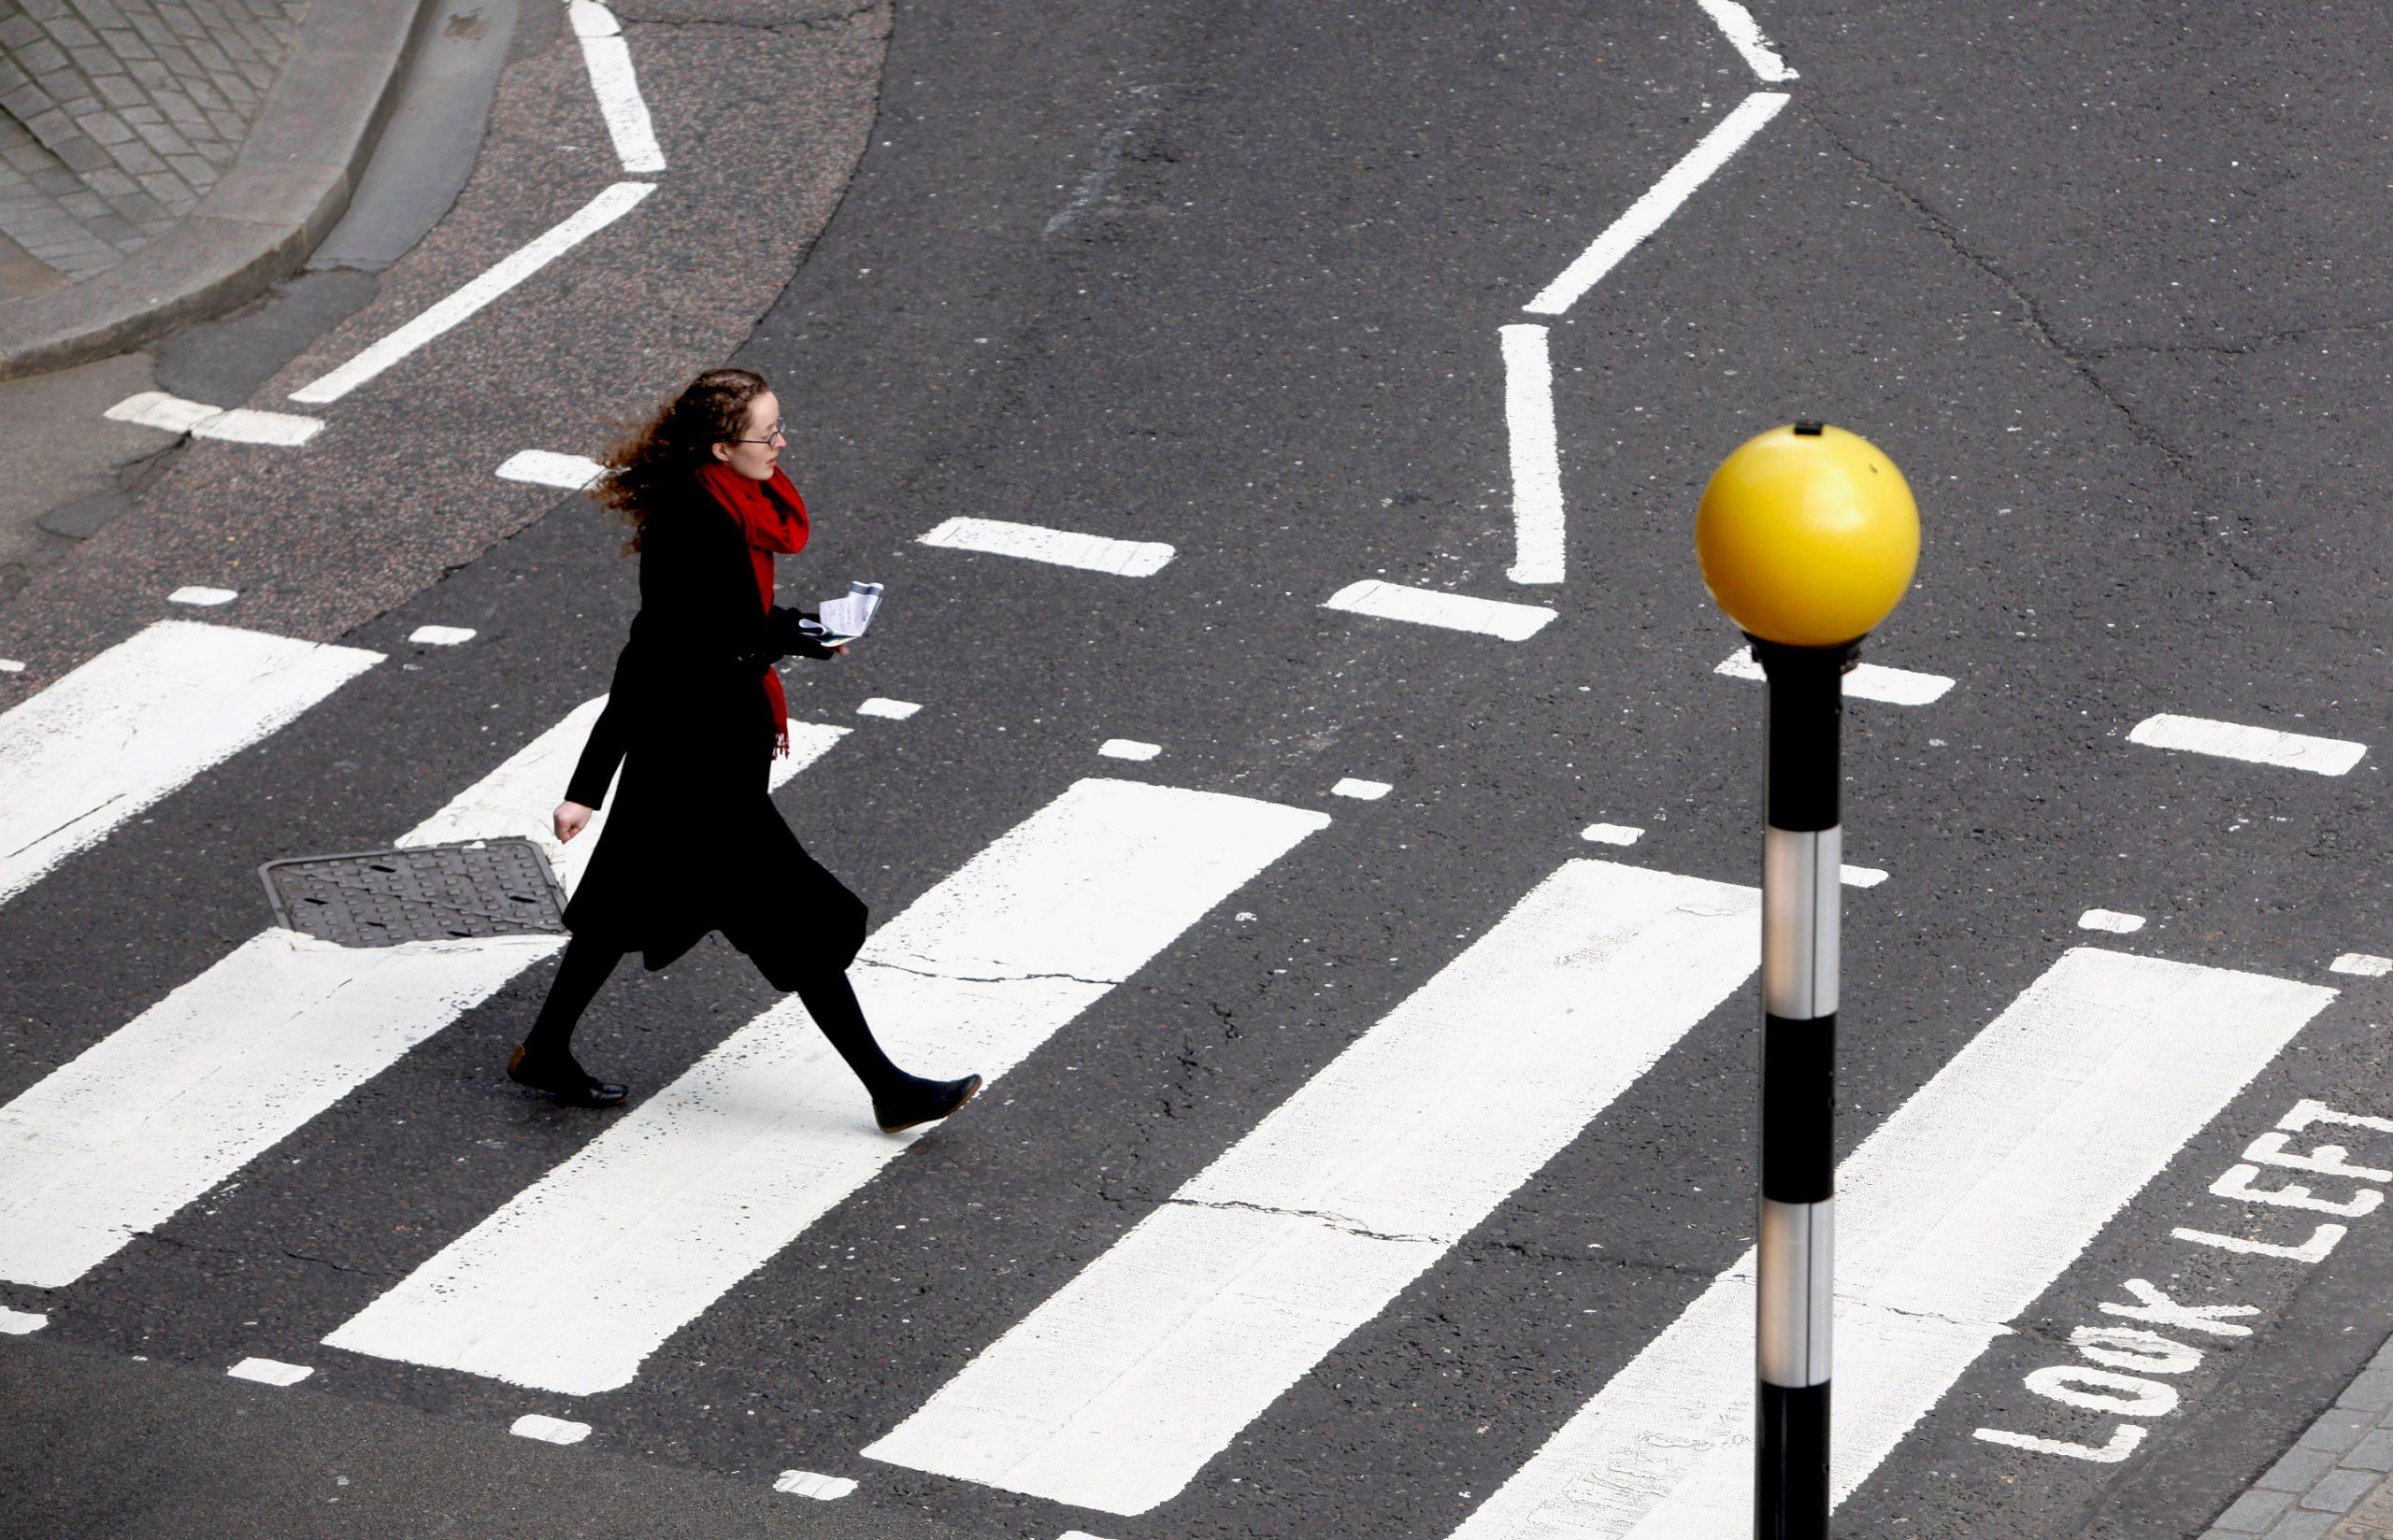 Преимущественное право пешехода на дороге